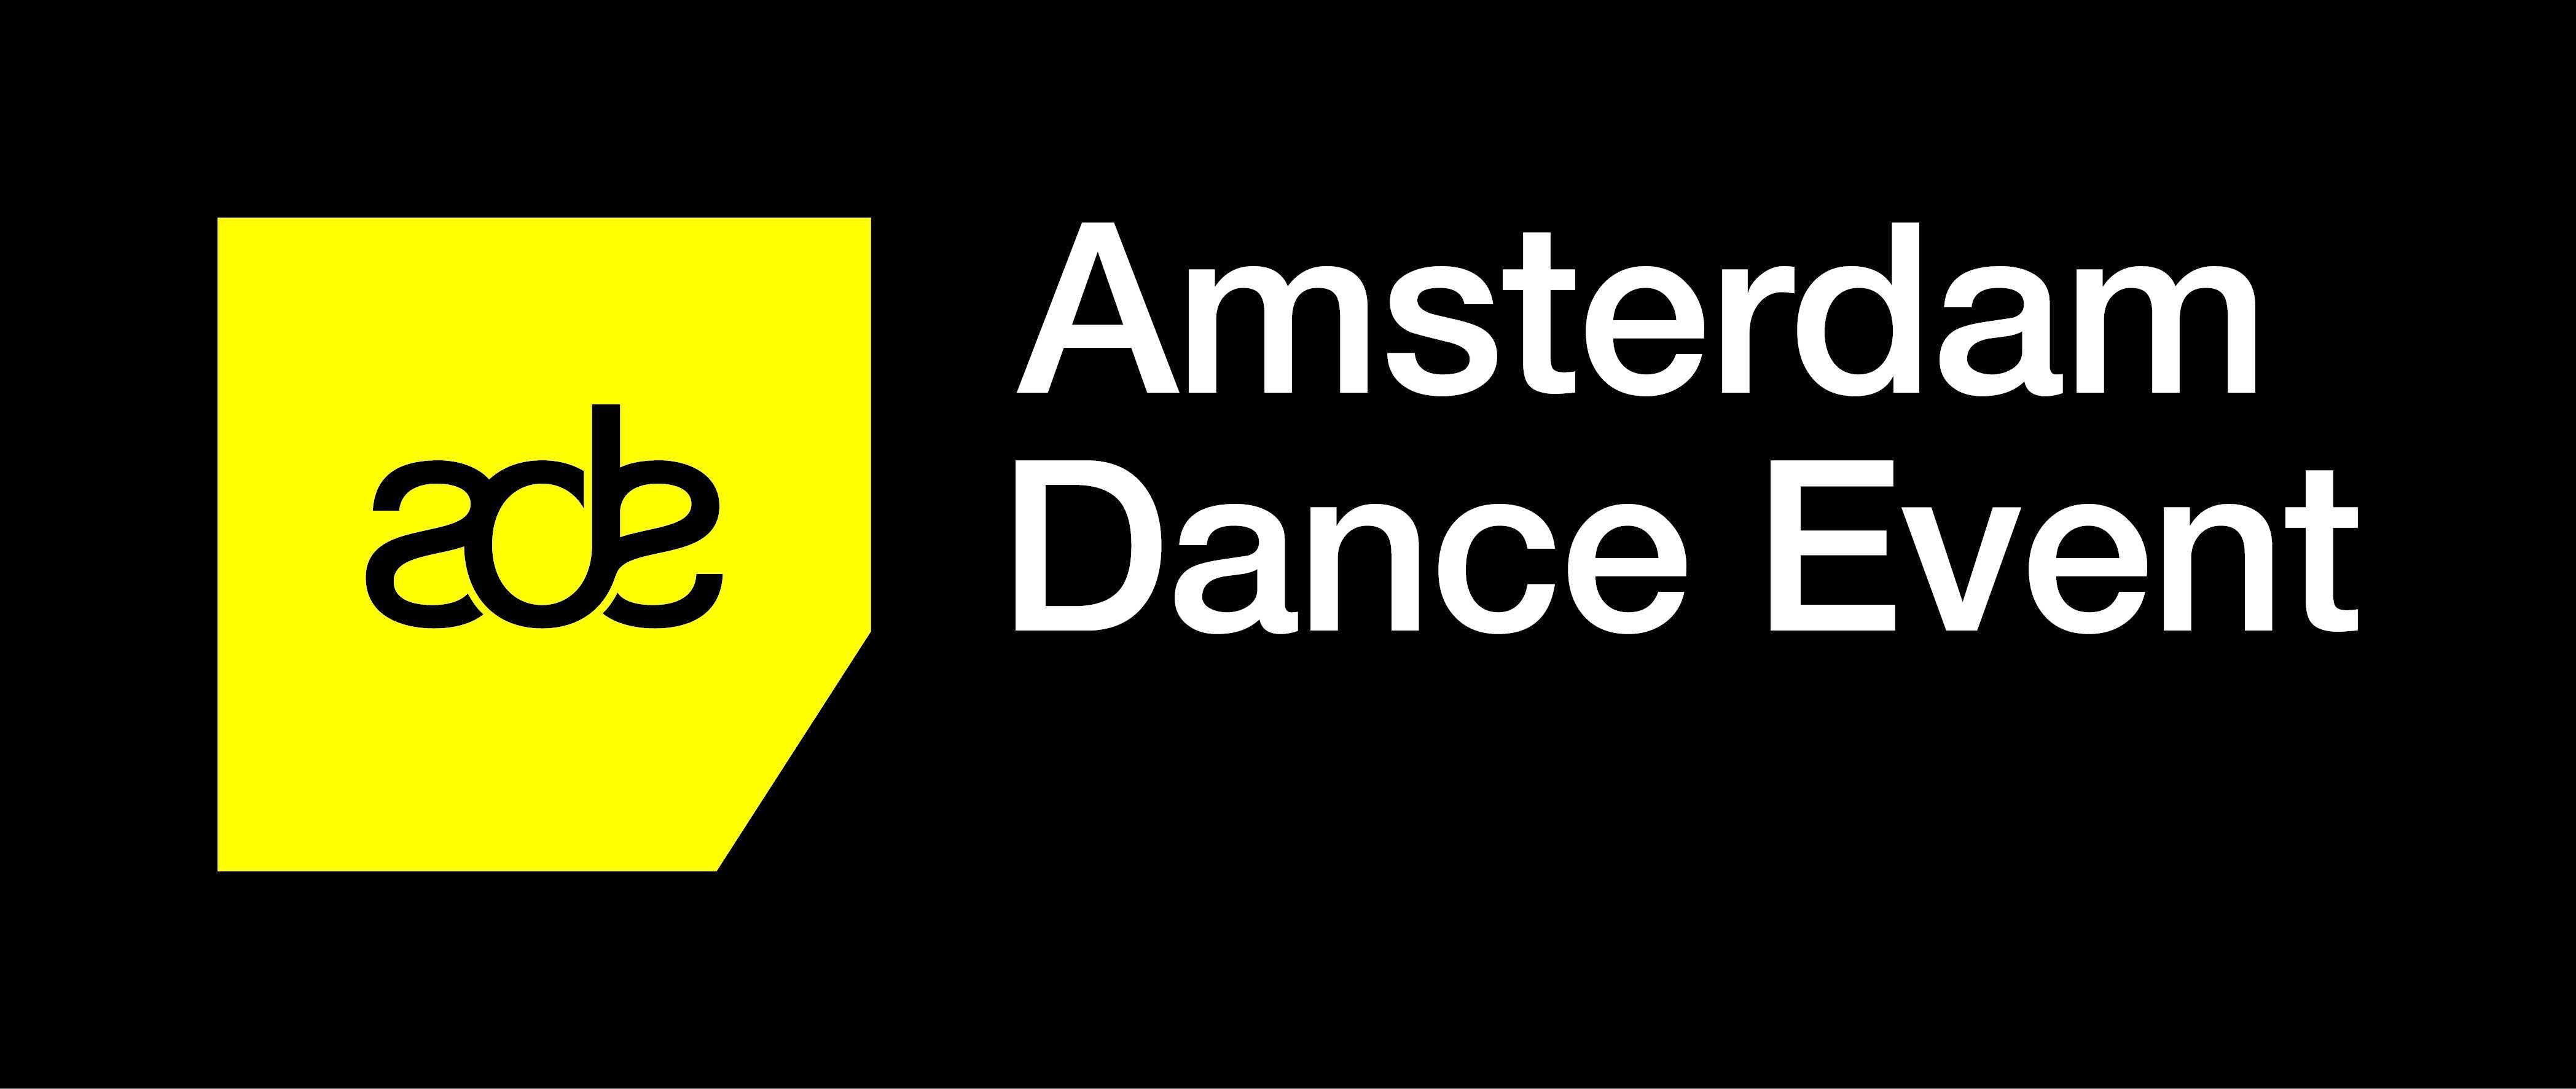 Amsterdam Dance Event | ADE